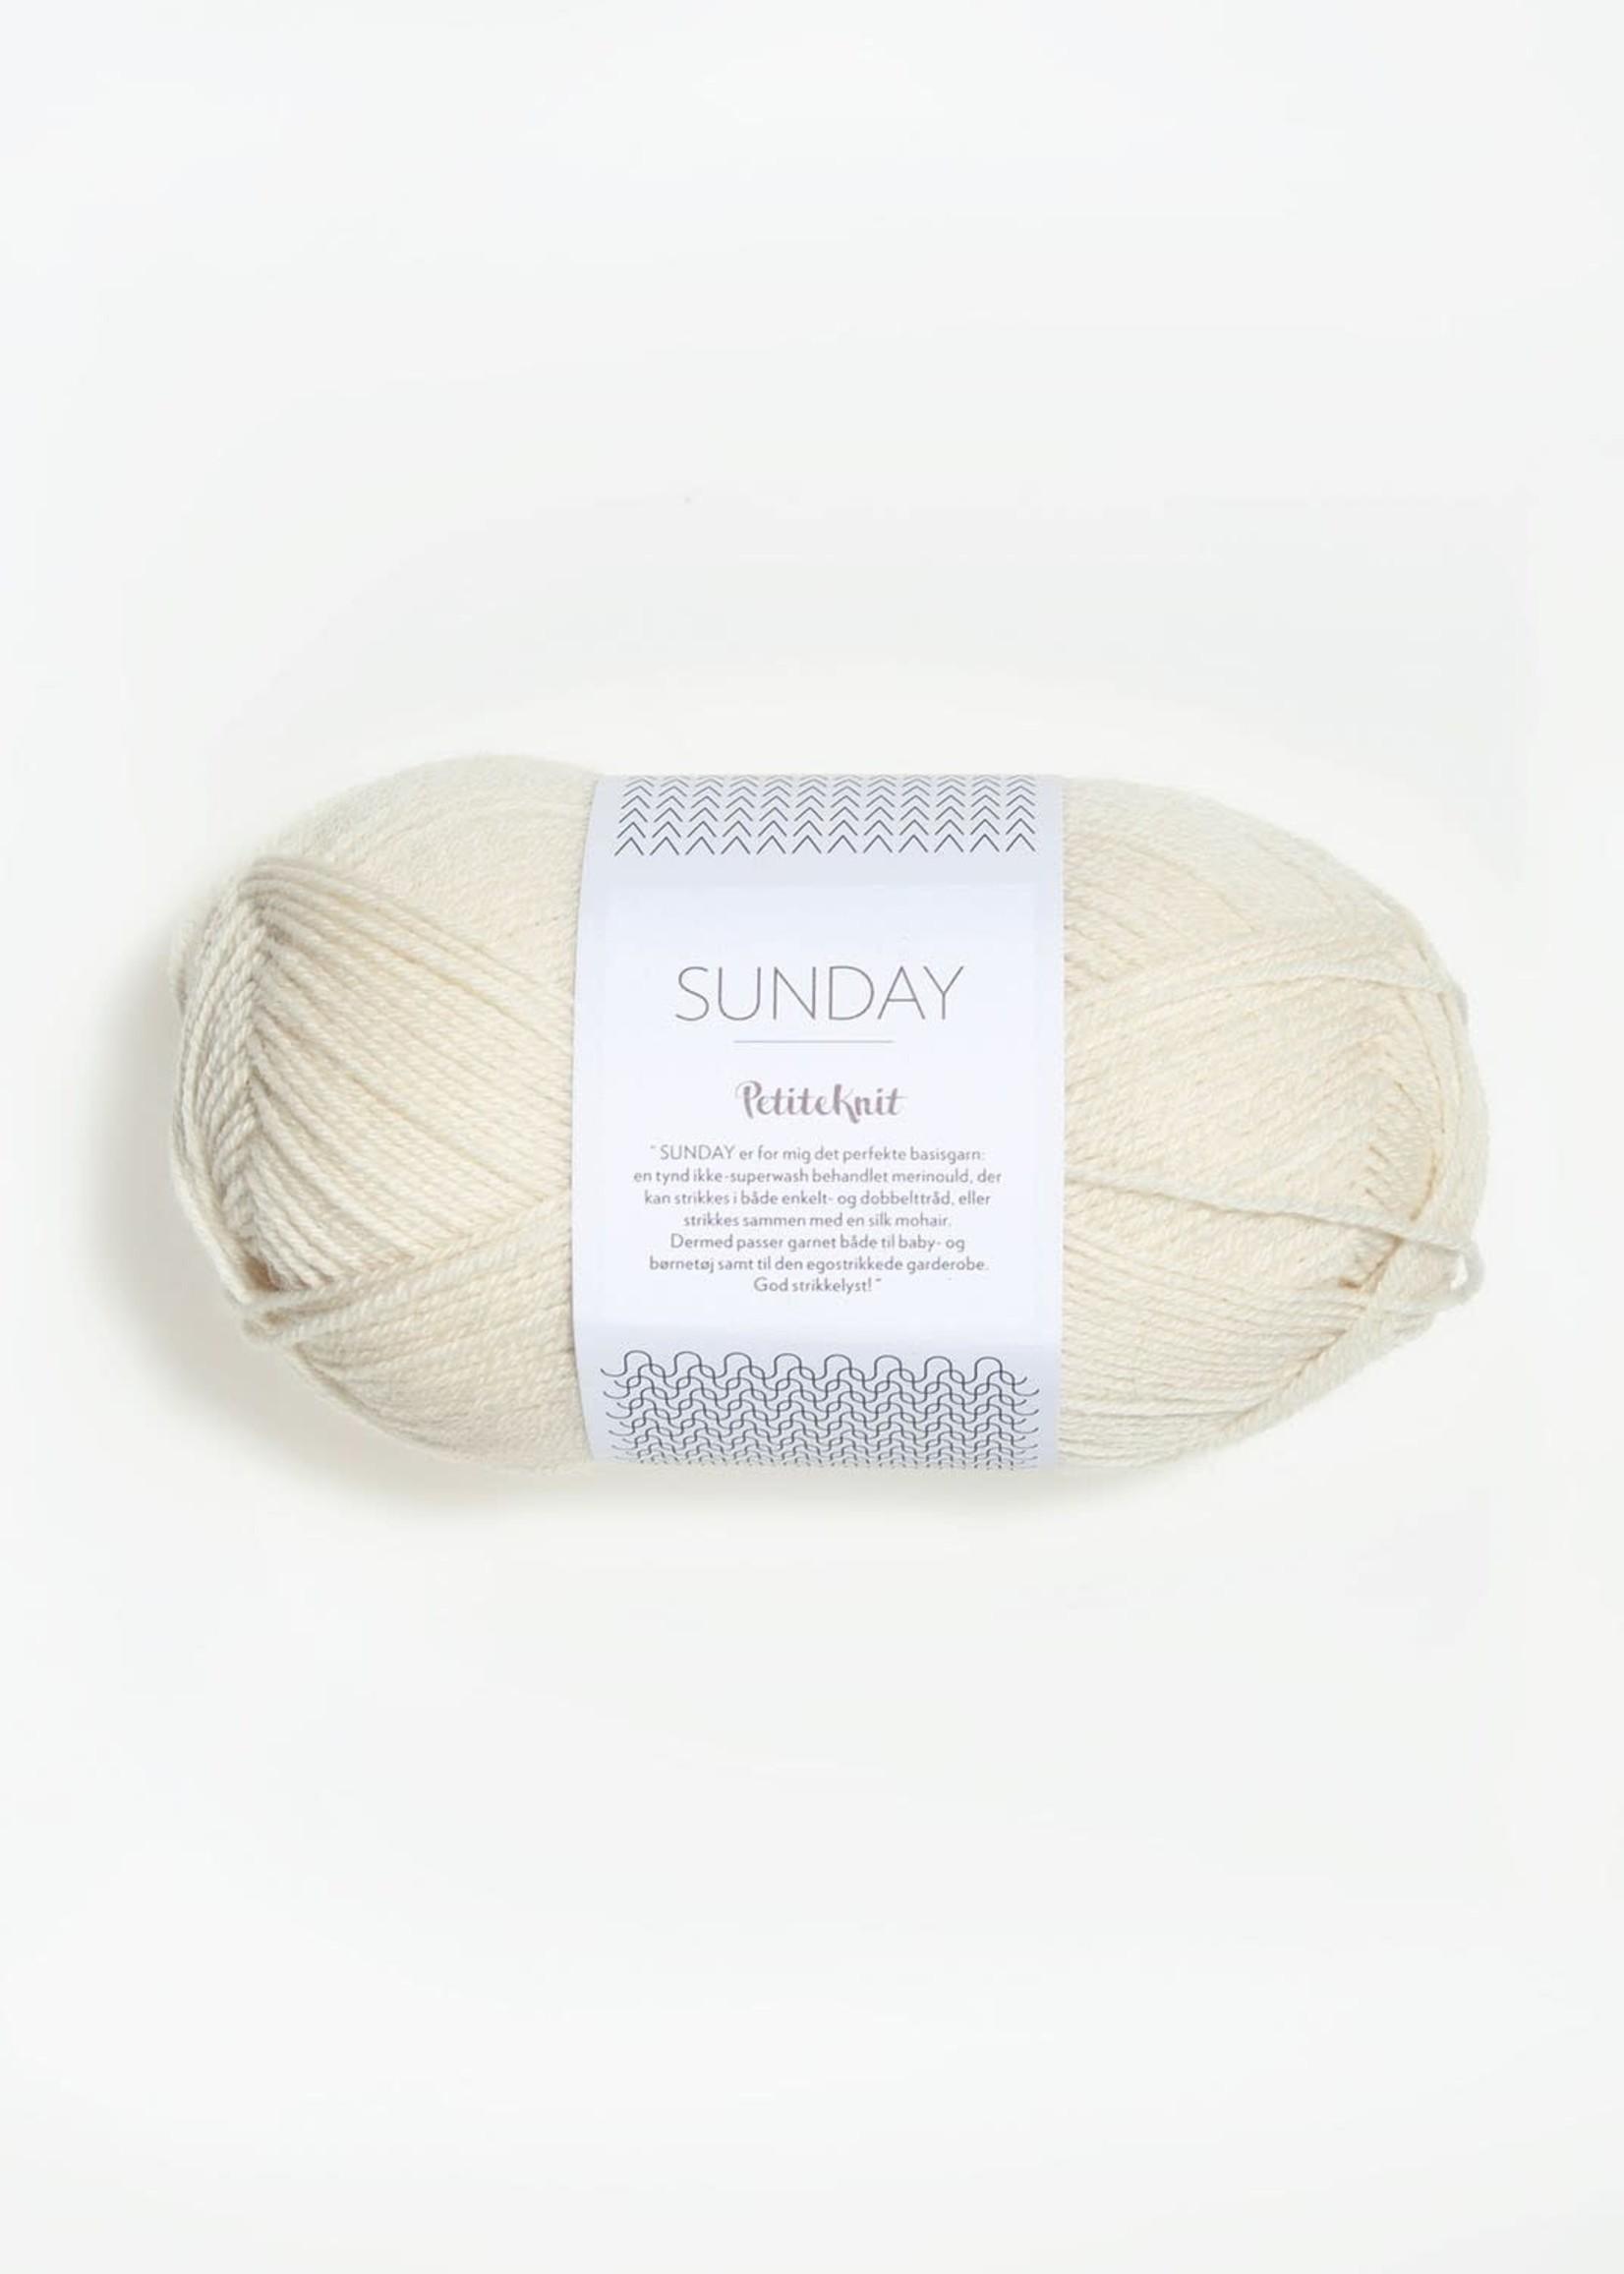 Sandnes Garn Sunday - #1012 Whipped Cream